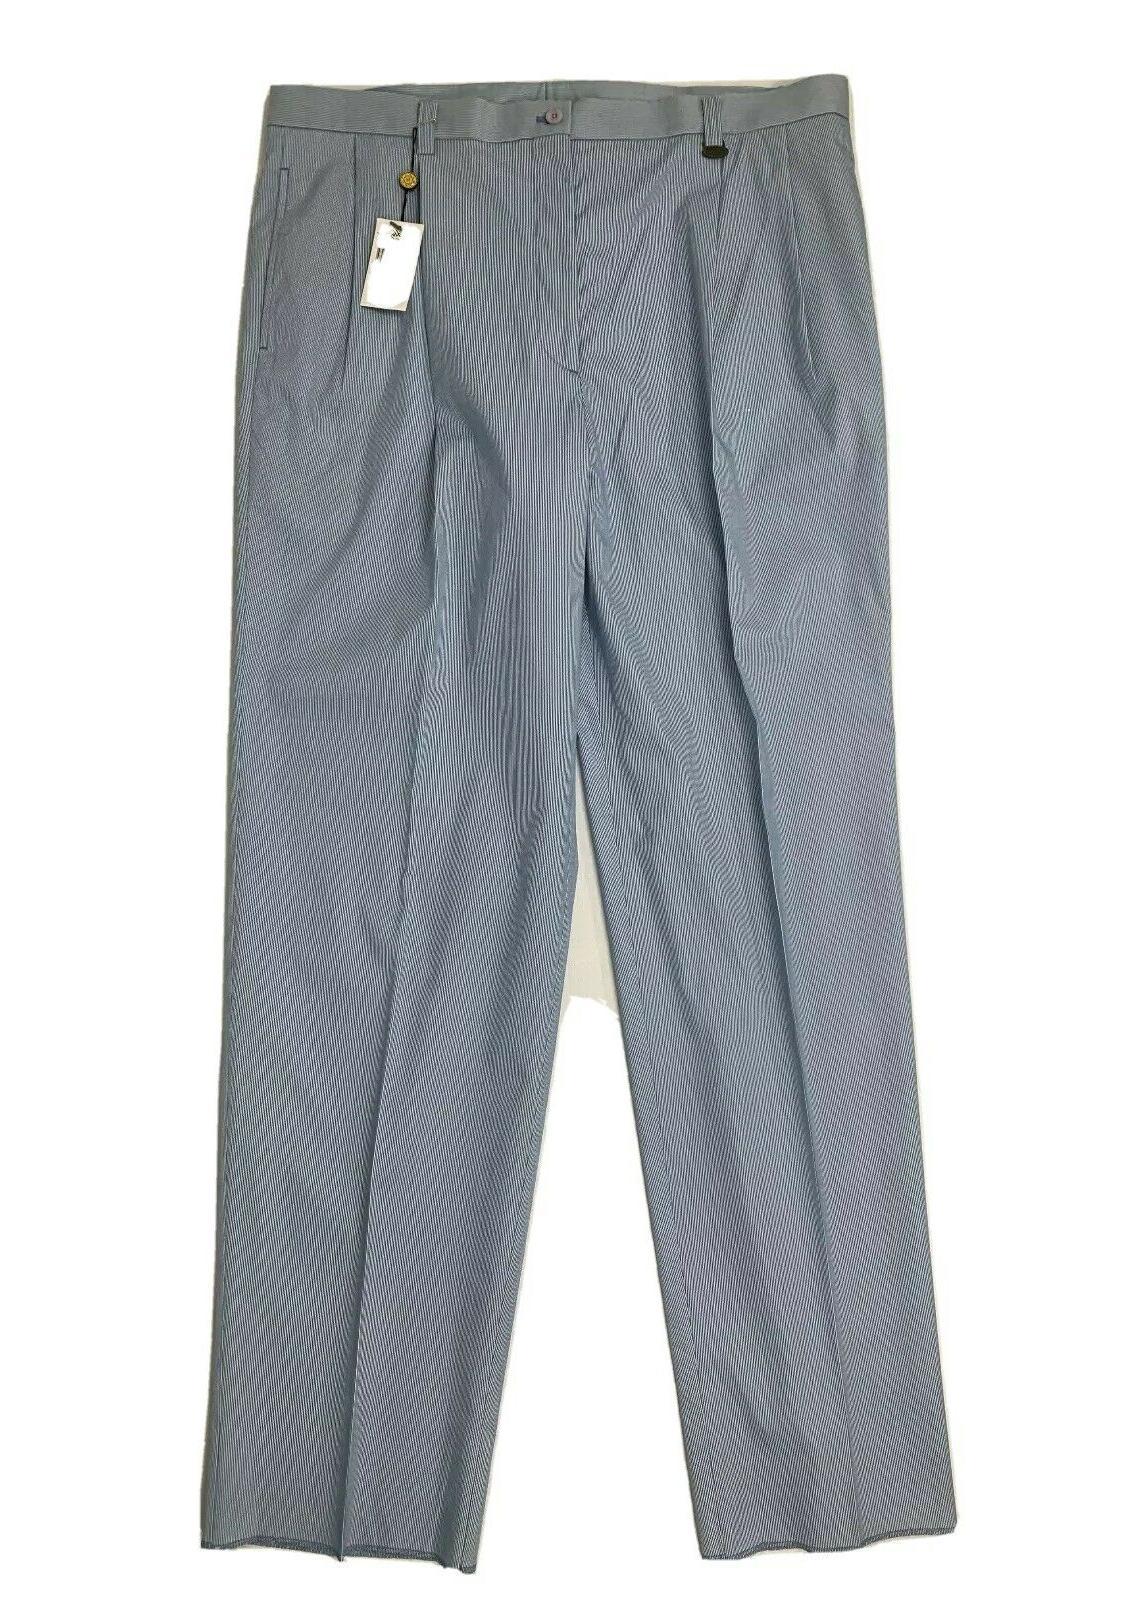 mens sz 40 golf dress pants blue